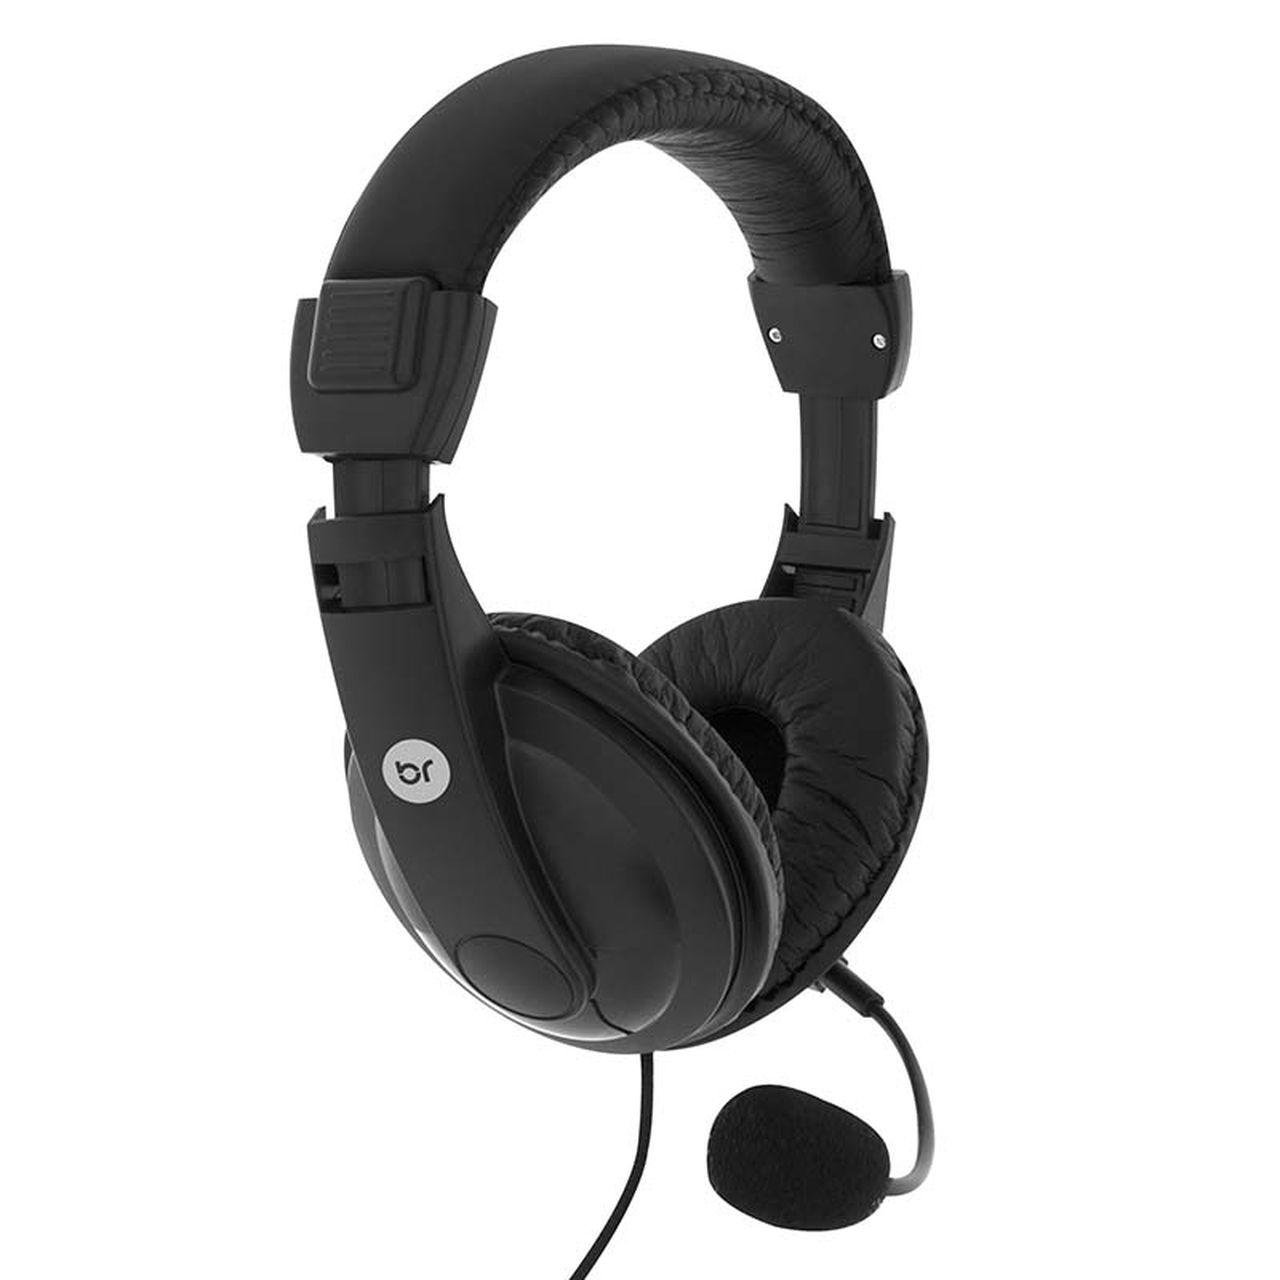 Headset Fone Estéreo P2 Office Haste Regulável Bright 507